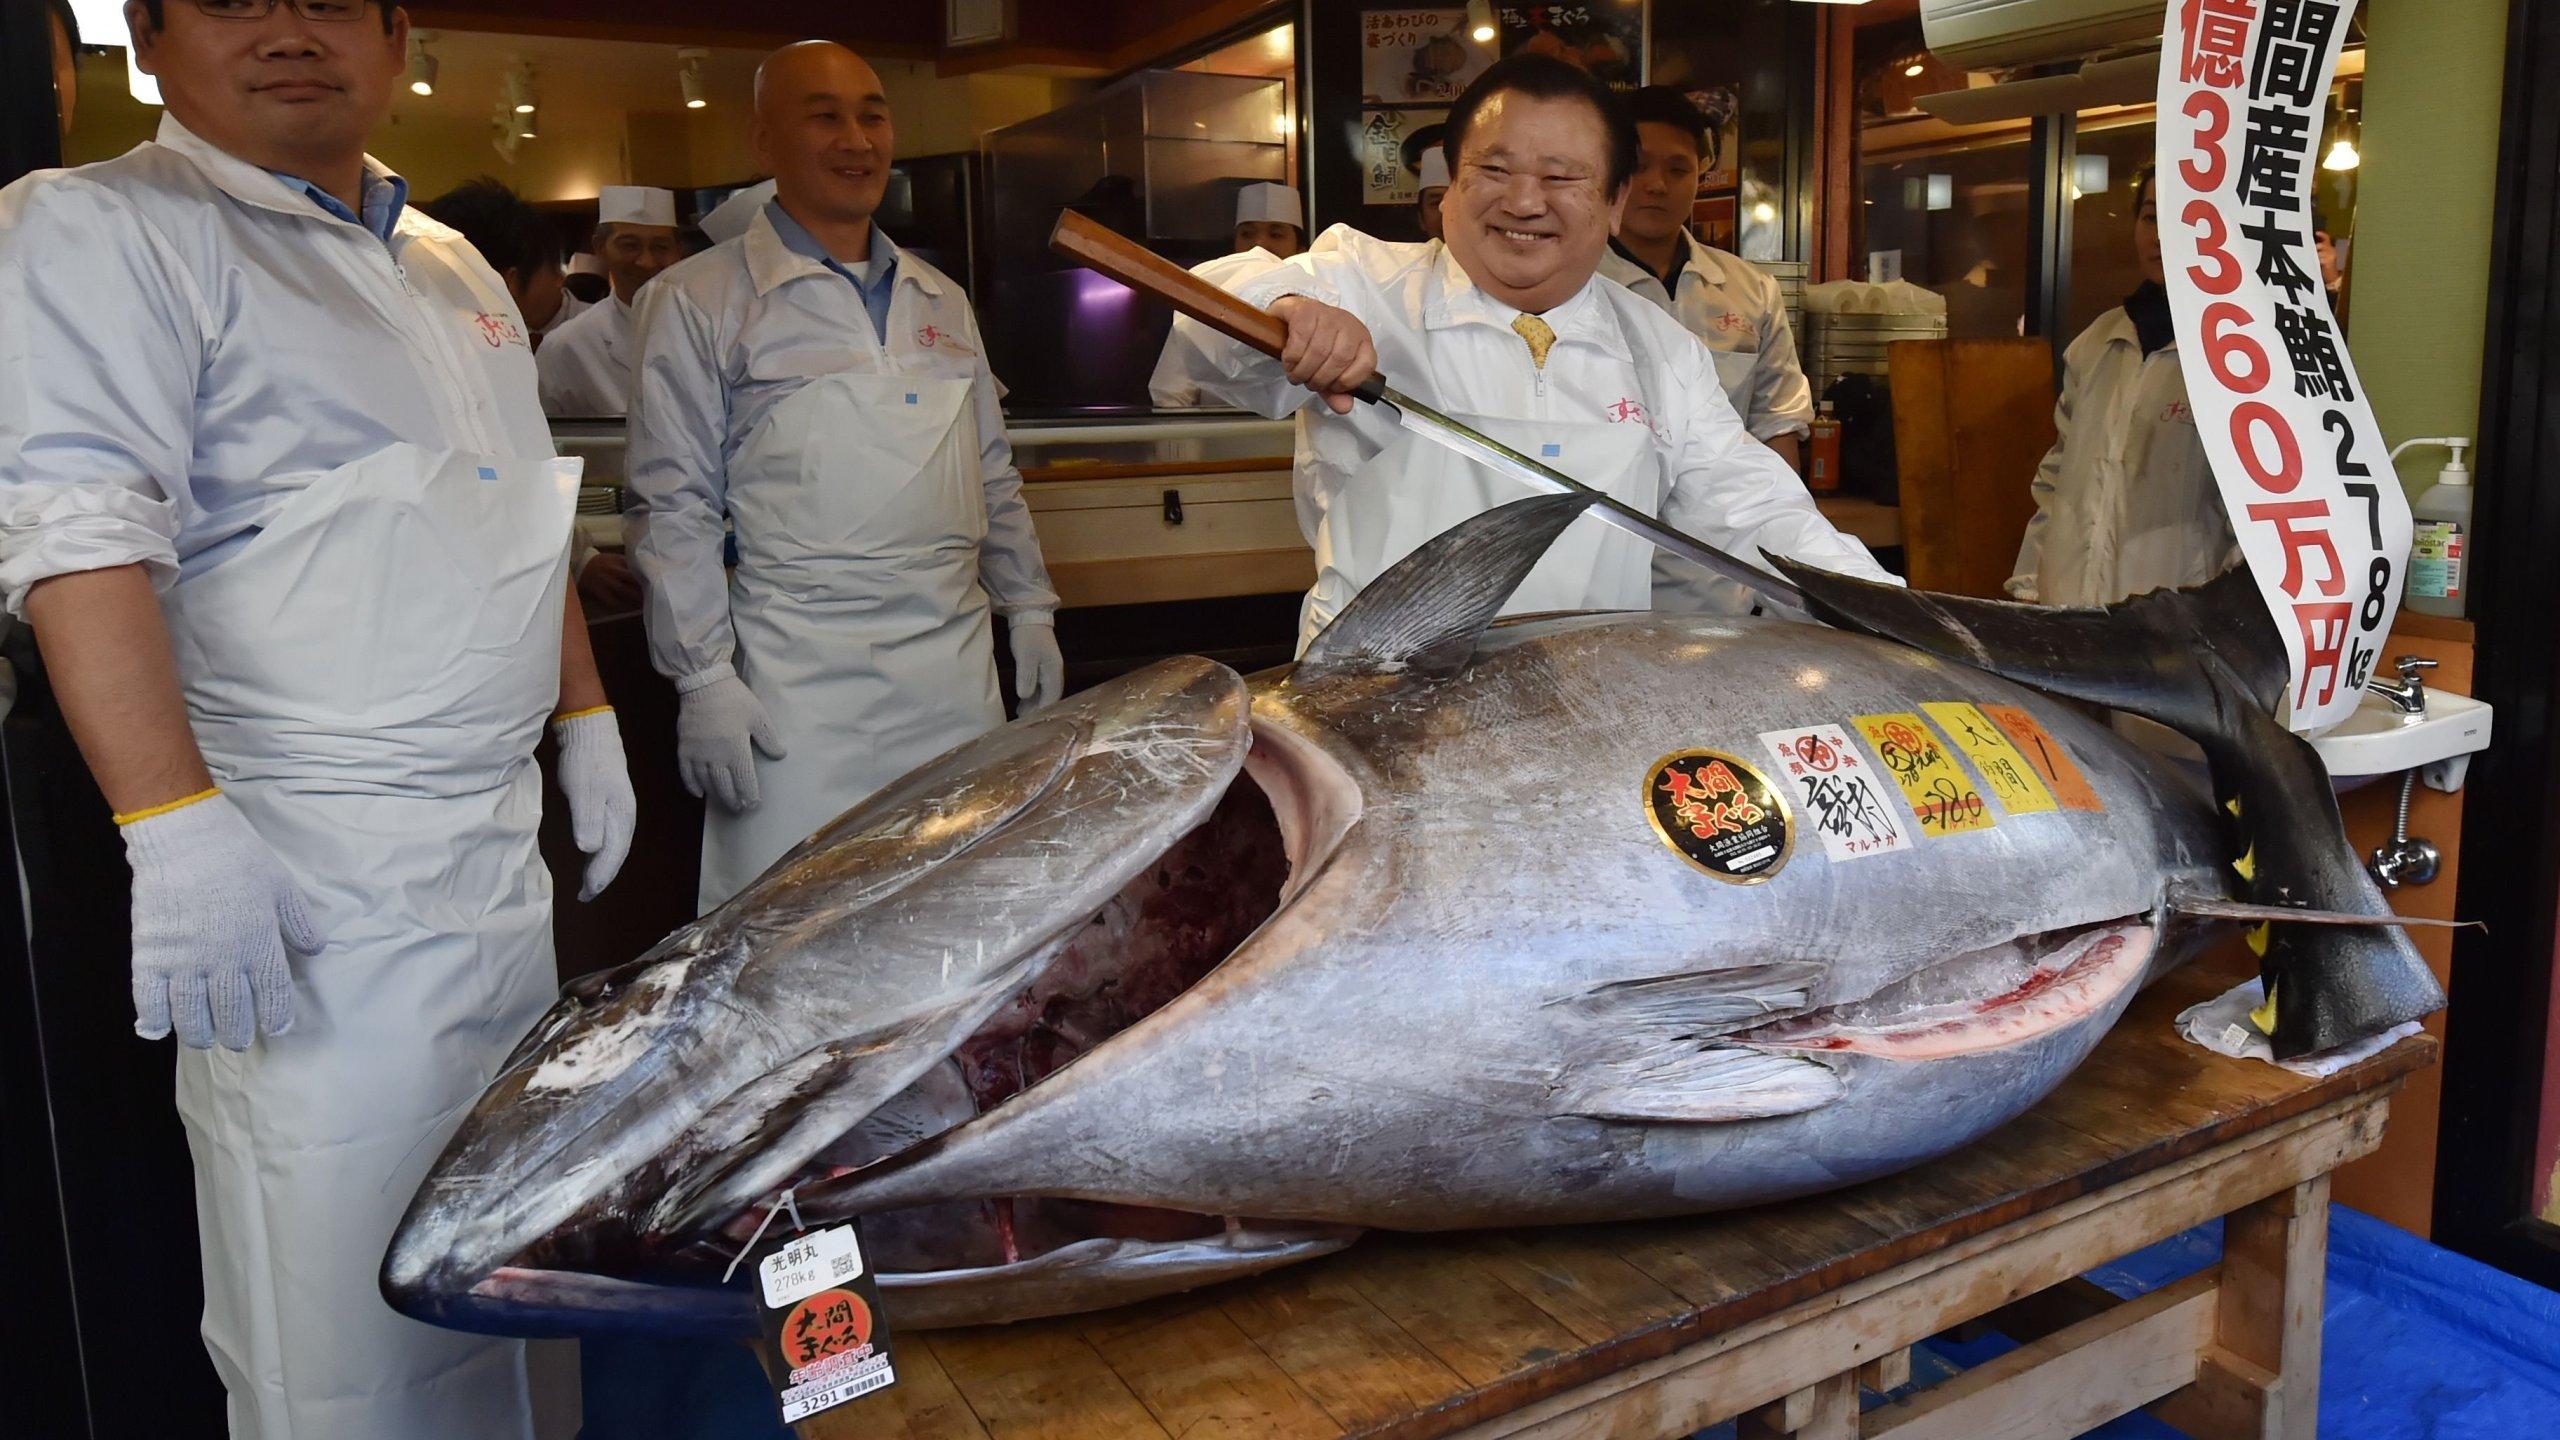 Kiyoshi Kimura, president of sushi restaurant chain Sushi-Zanmai, displays the record-setting tuna at his main restaurant in Tokyo. (Credit: CNN)